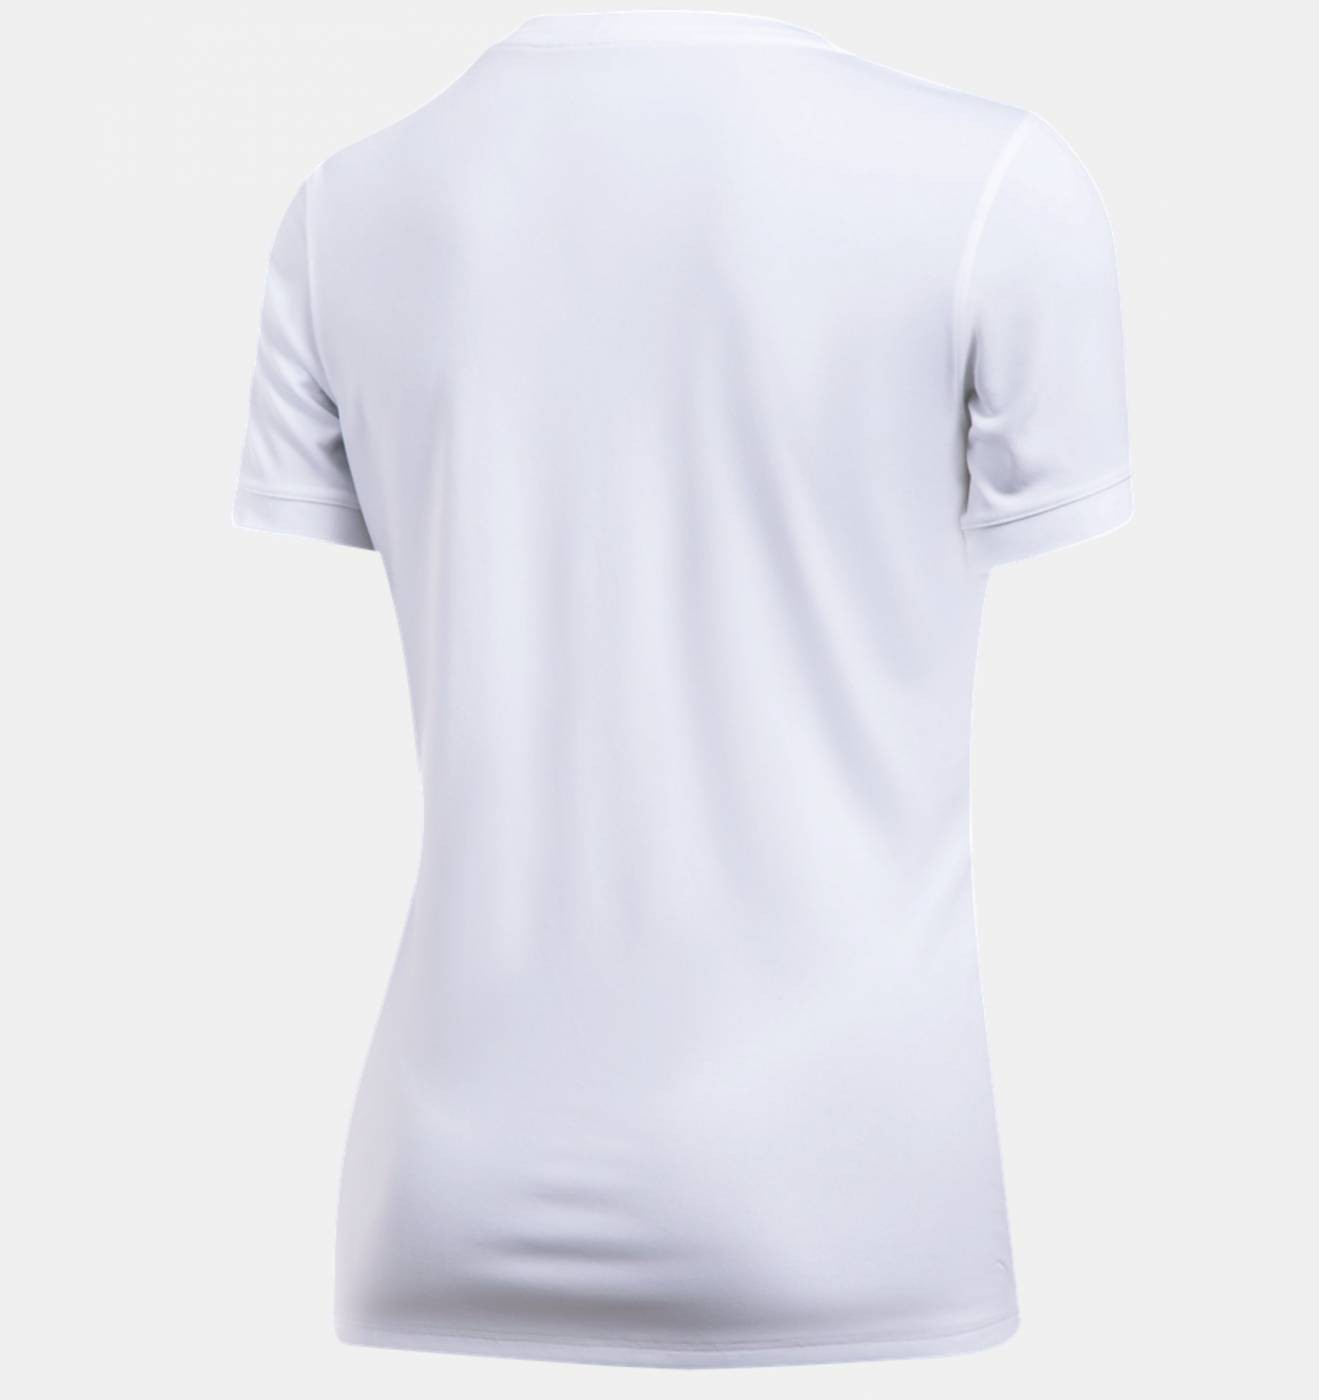 Camisa 2 Fluminense Feminina 2017 Under Armour